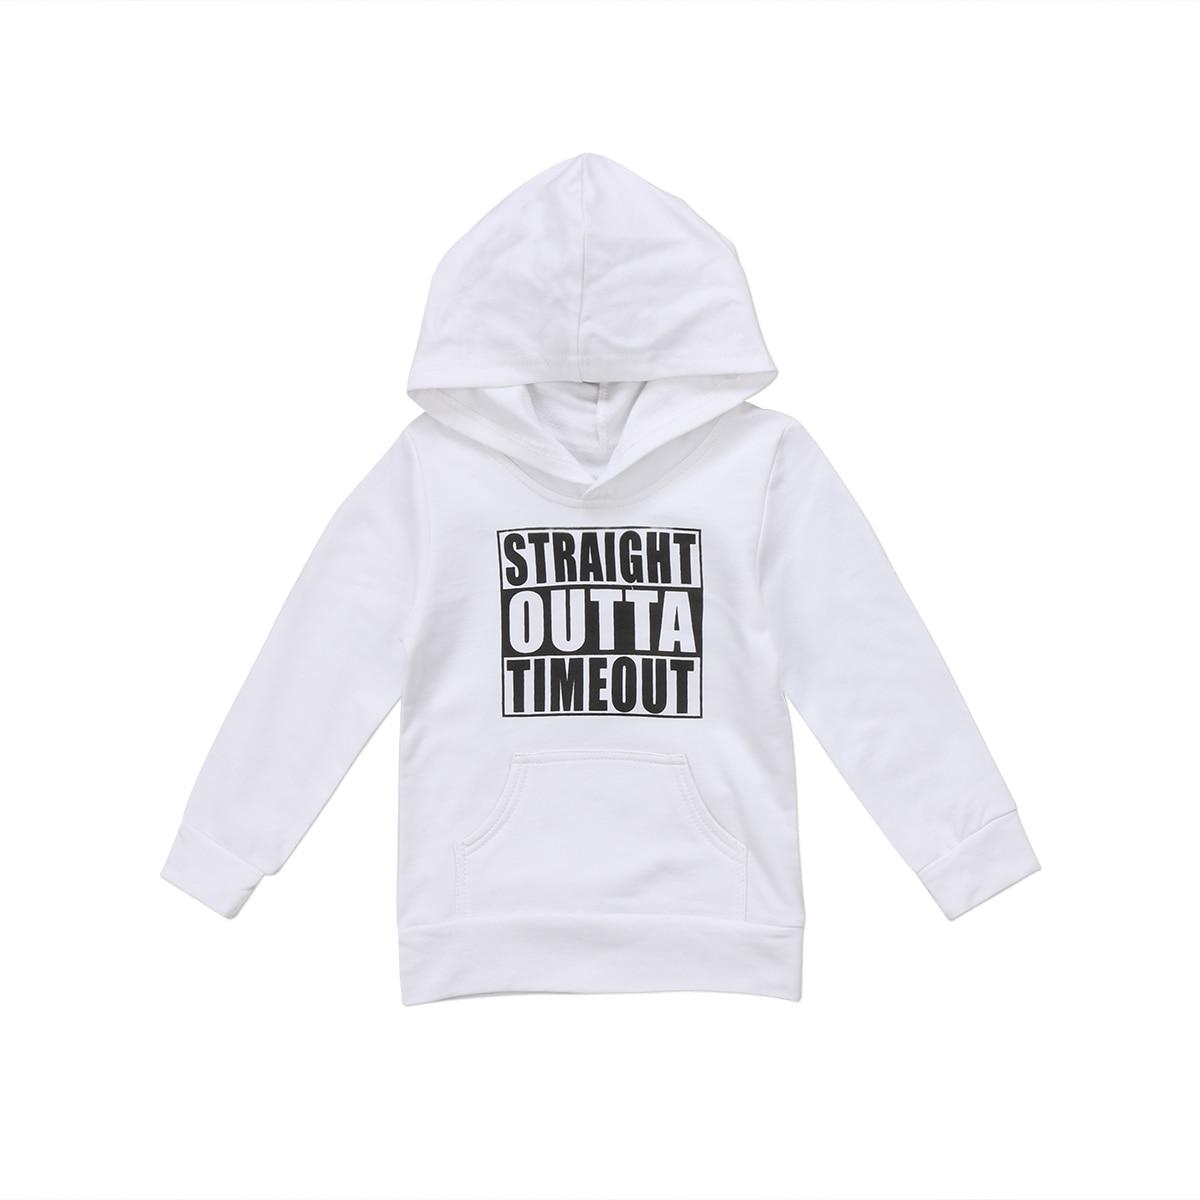 Pudcoco US Stock Newborn KIds Baby Boy Girl Clothes Hoodie Tops Hooded Sweatshirt Casual Outdoor Sport 8